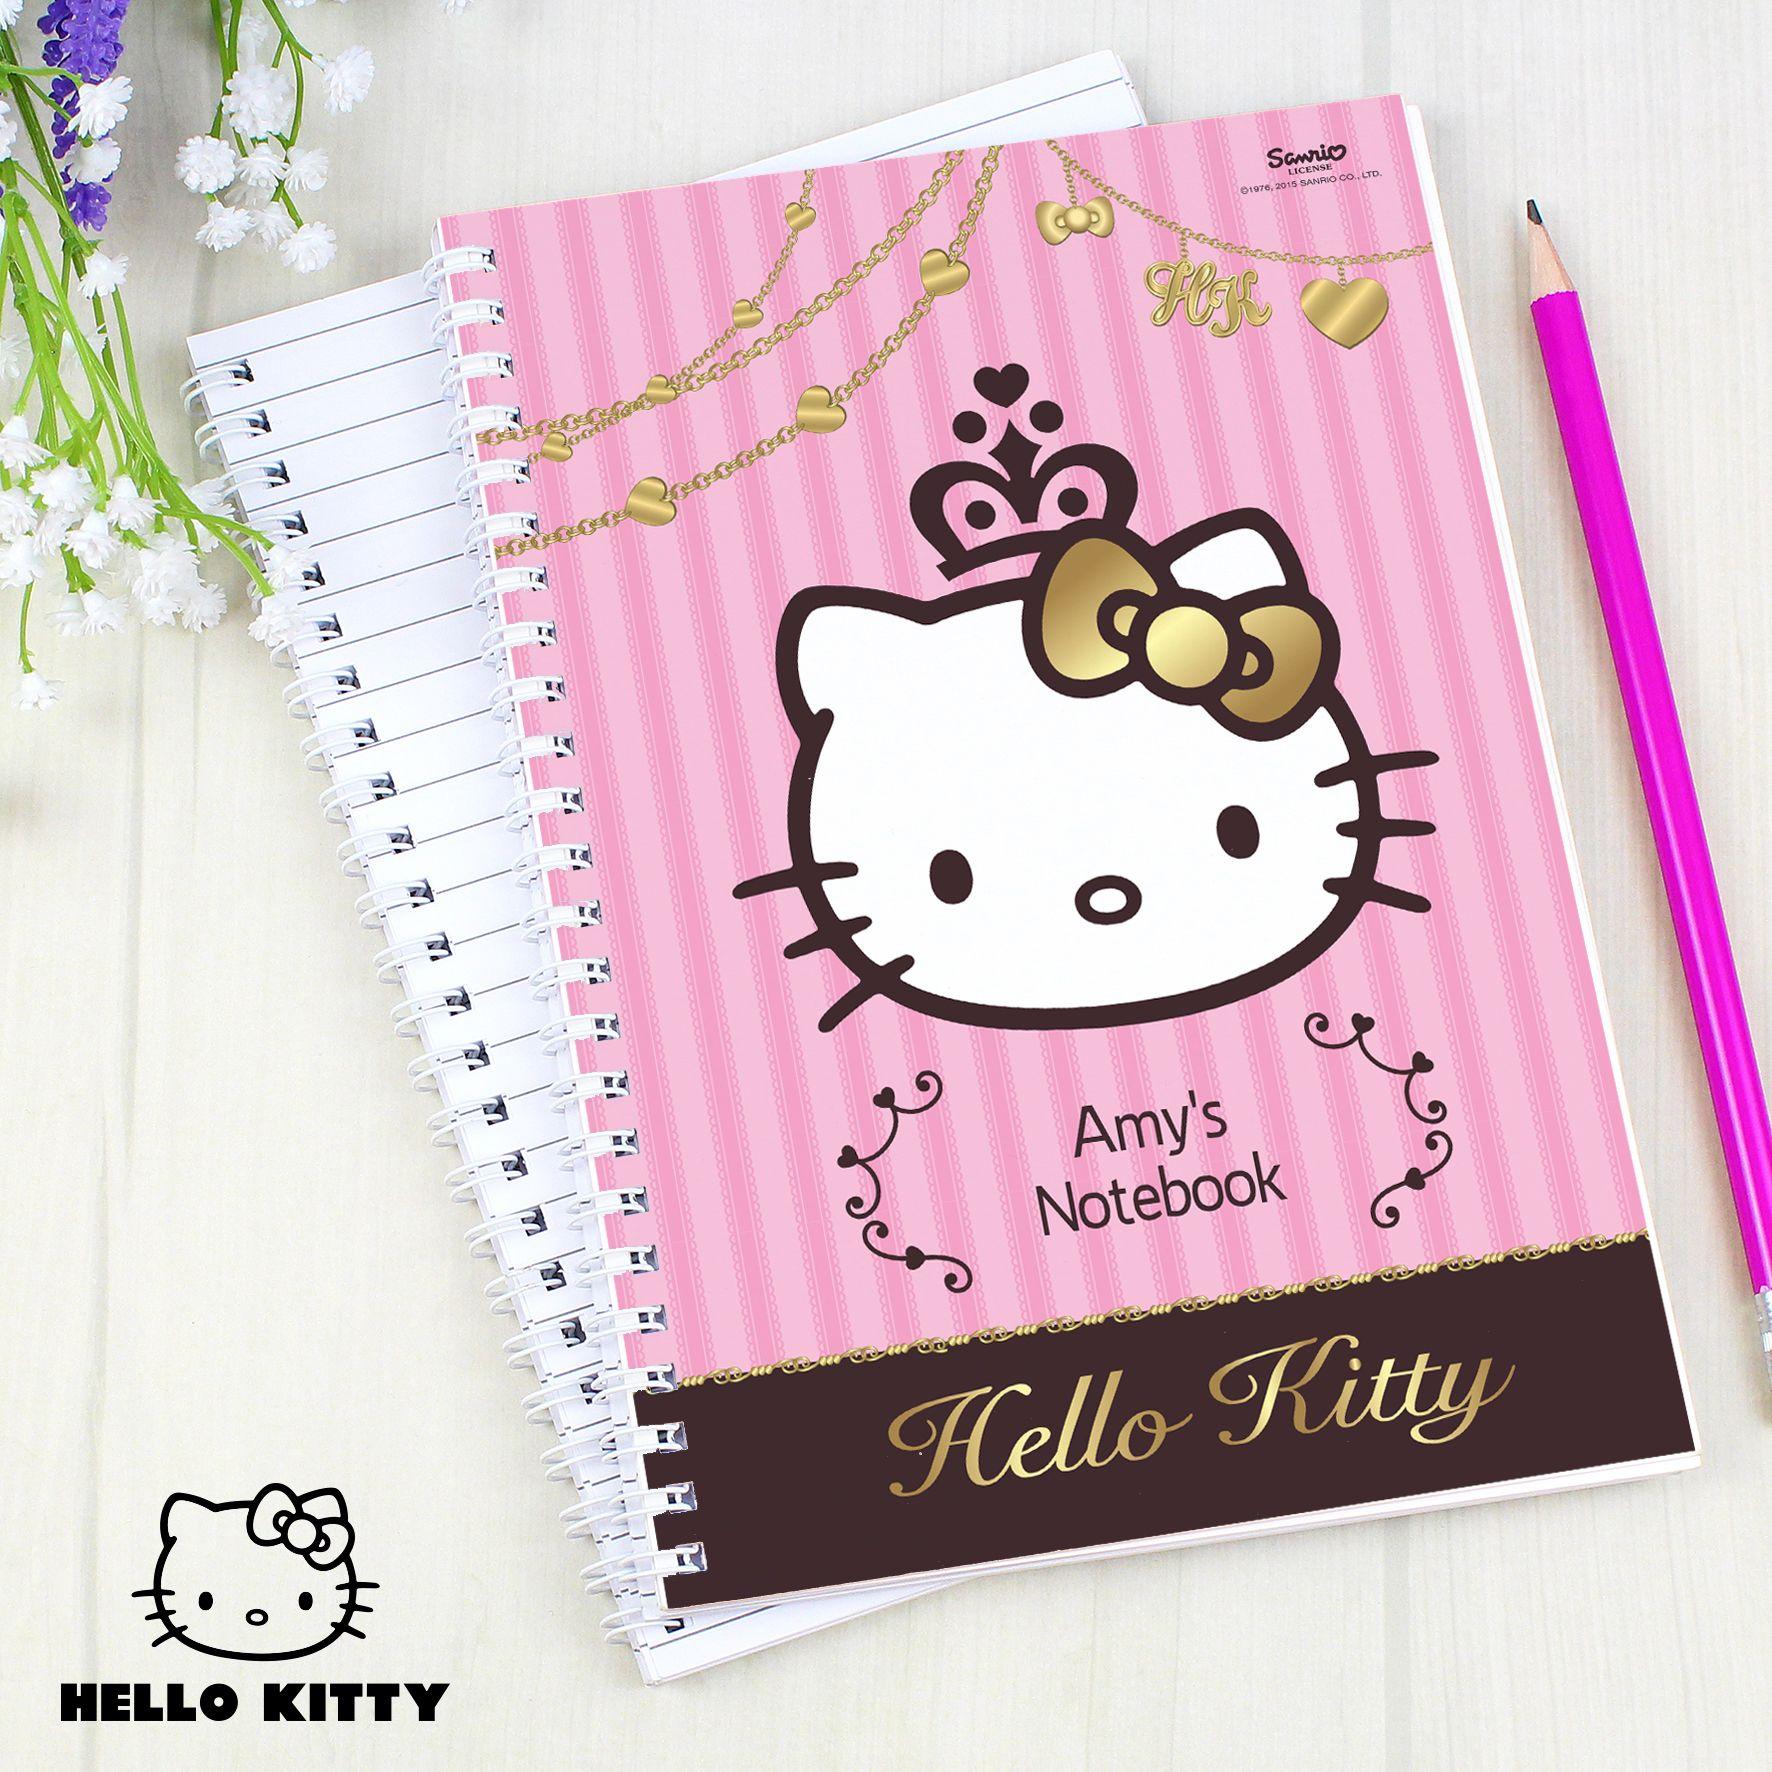 Hello kitty chic notebook